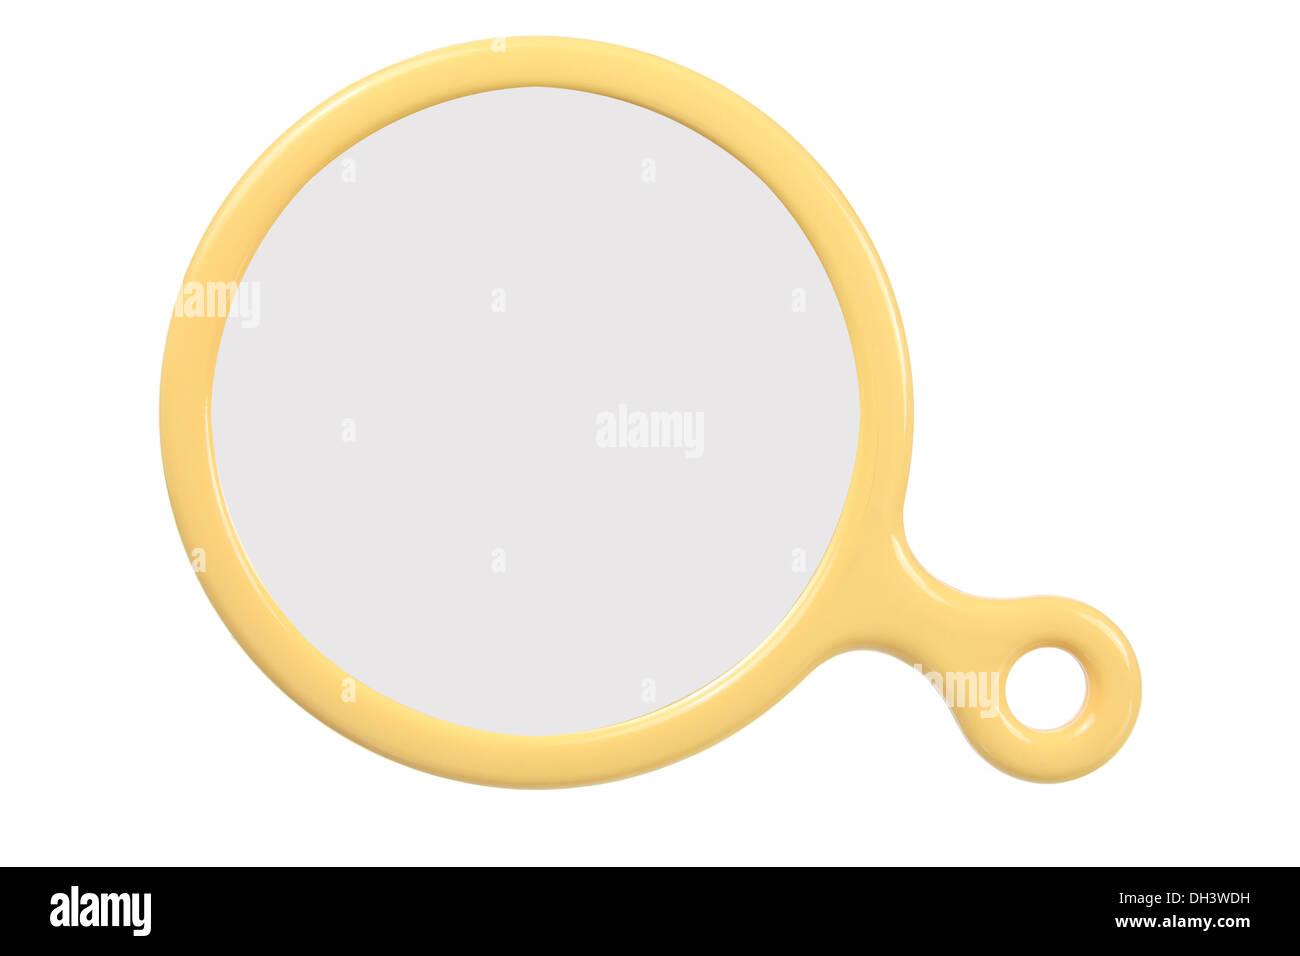 Round Hand Mirror - Stock Image